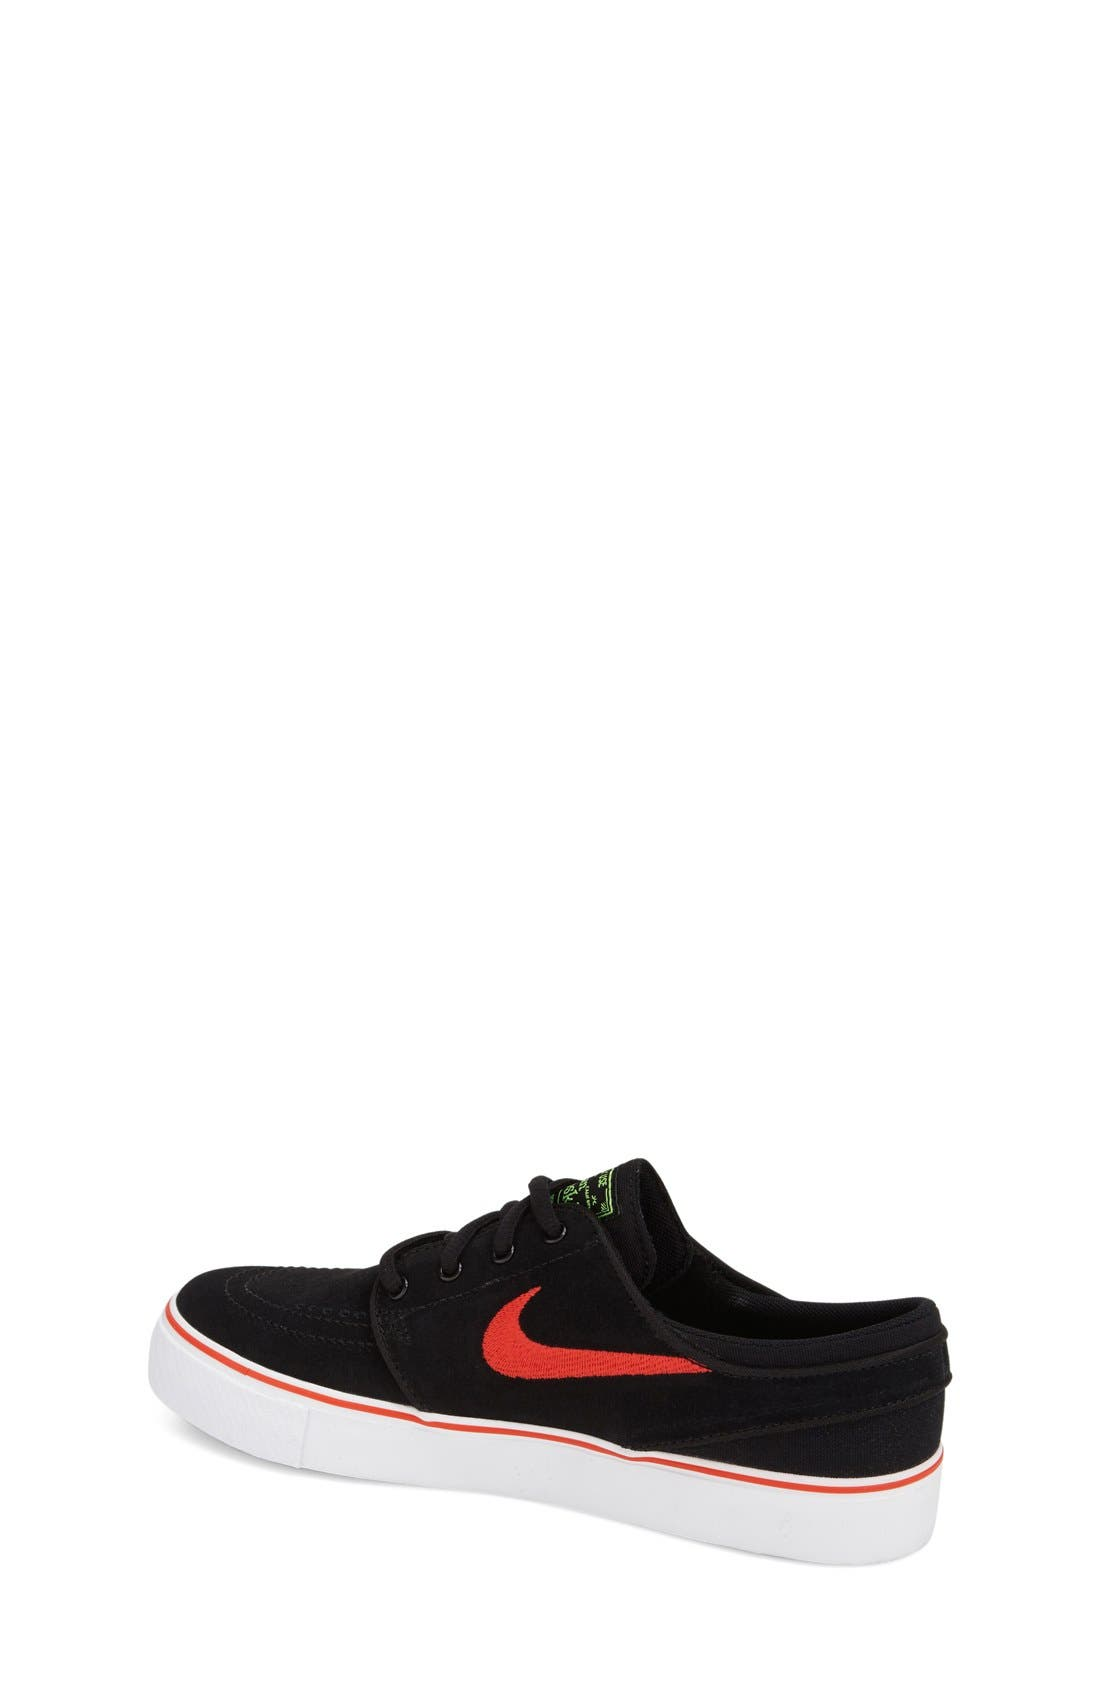 'Stefan Janoski' Sneaker,                             Alternate thumbnail 30, color,